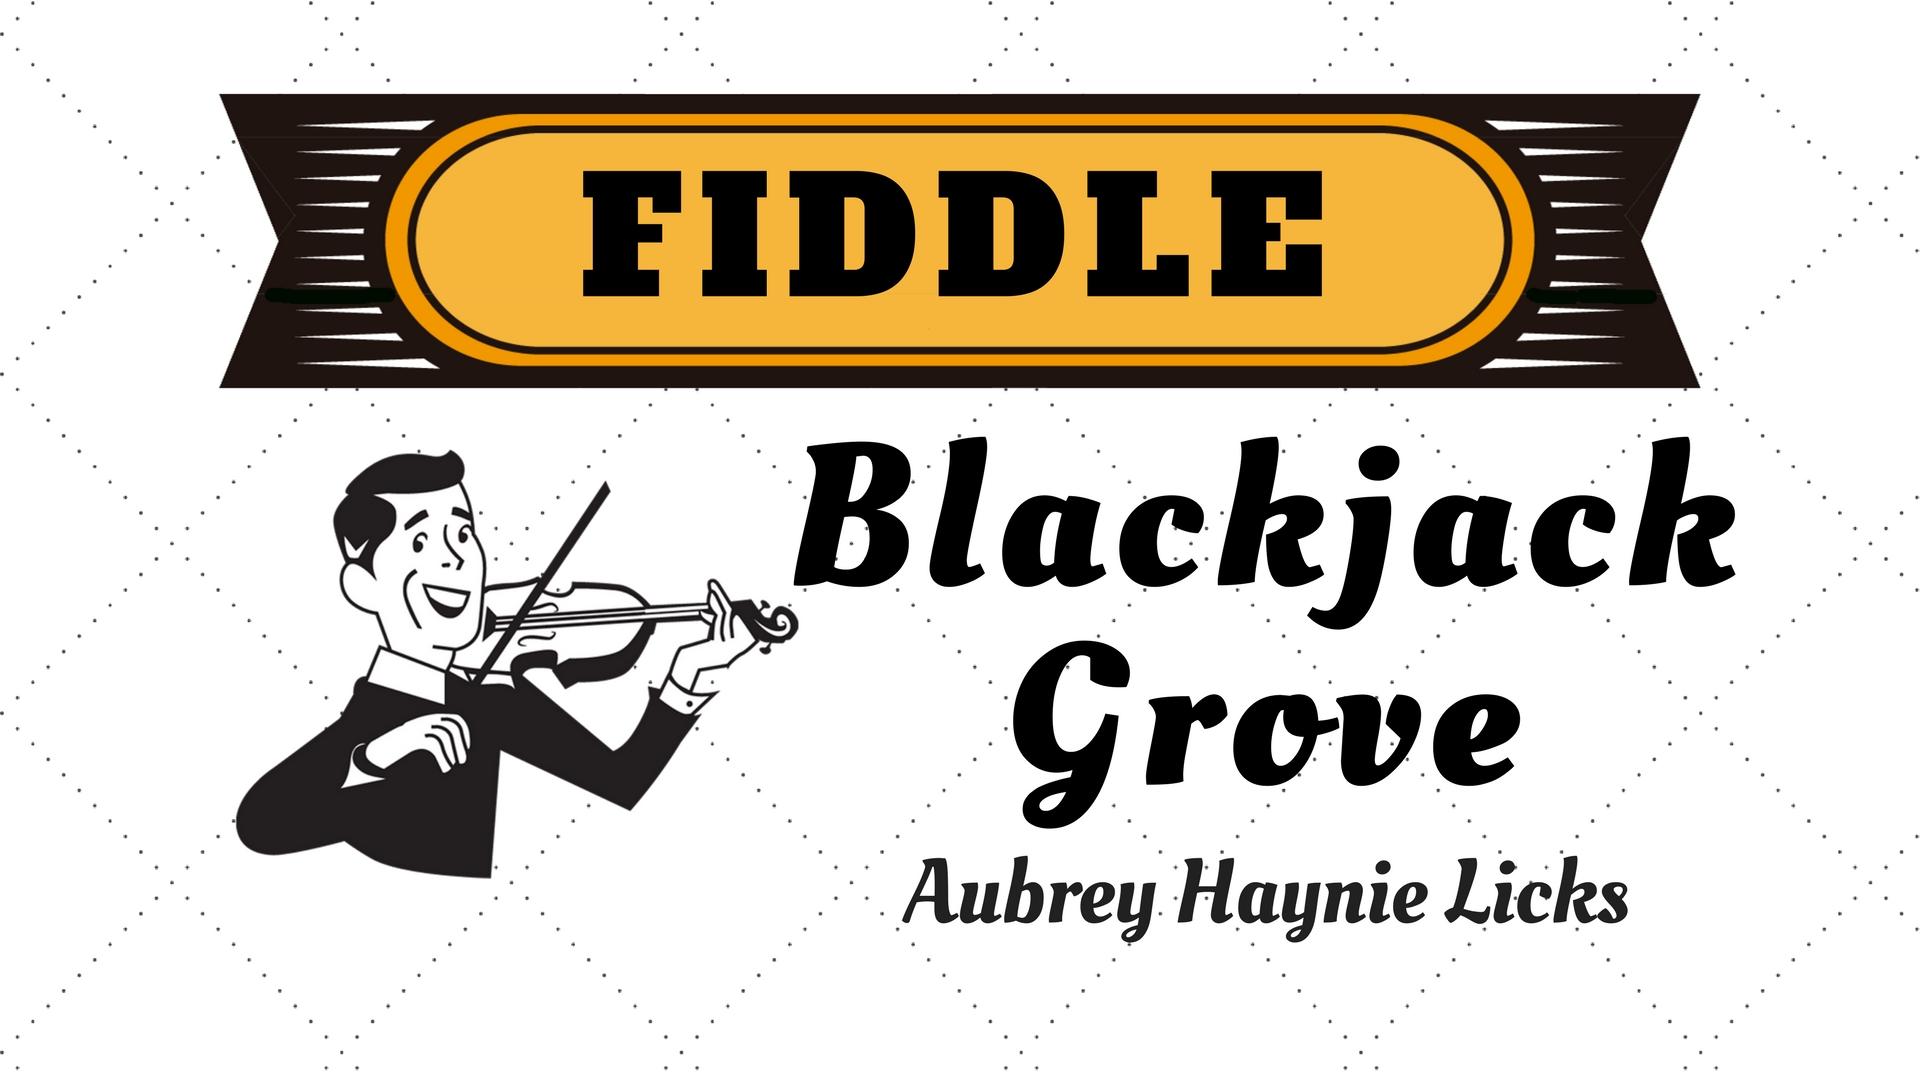 Fiddle Blackjack Grove